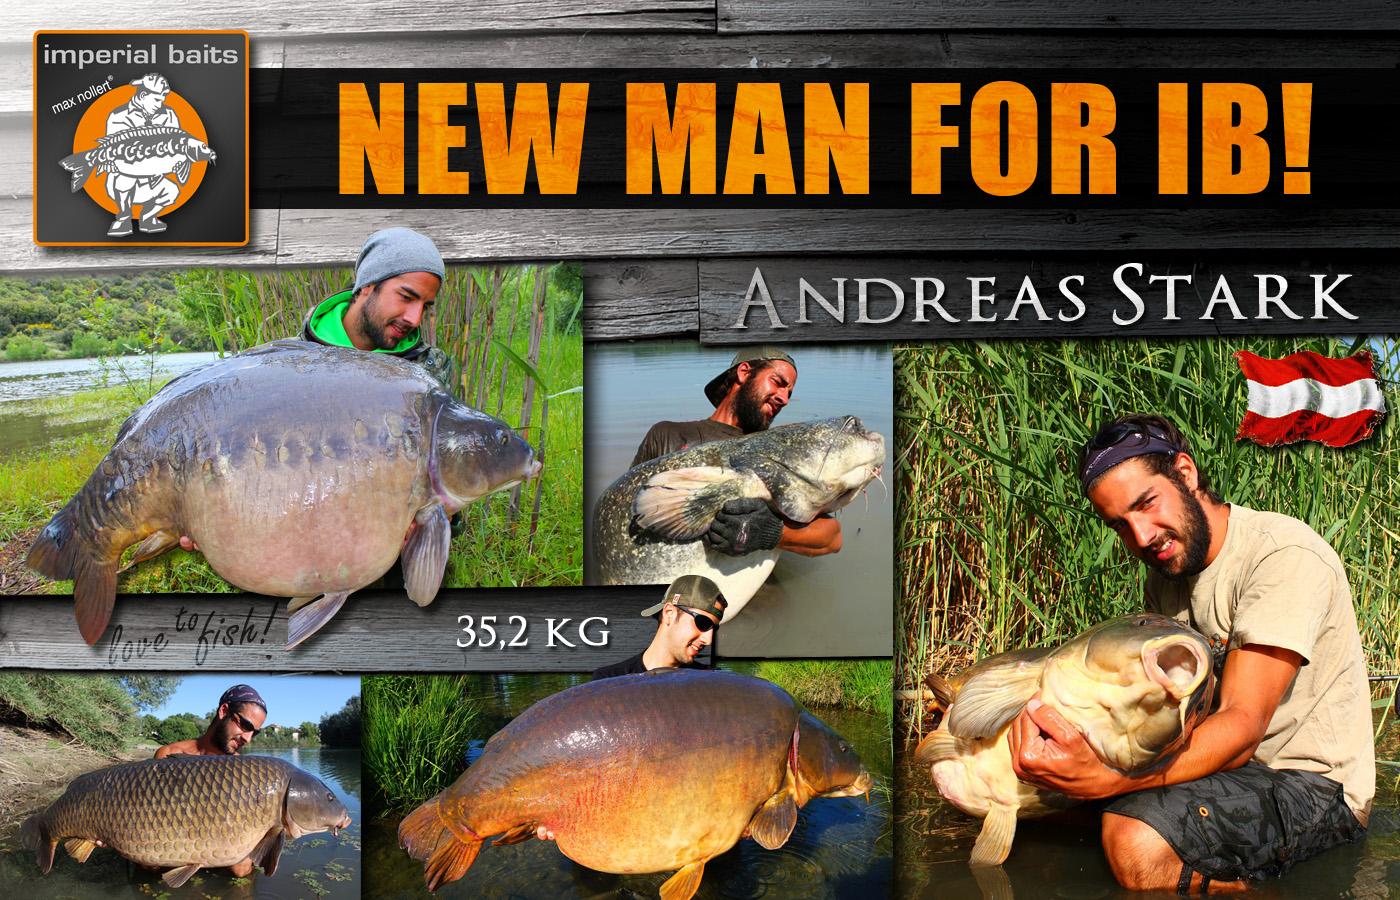 andy stark teamvorstellung - NEW IB MAN: Andreas Stark